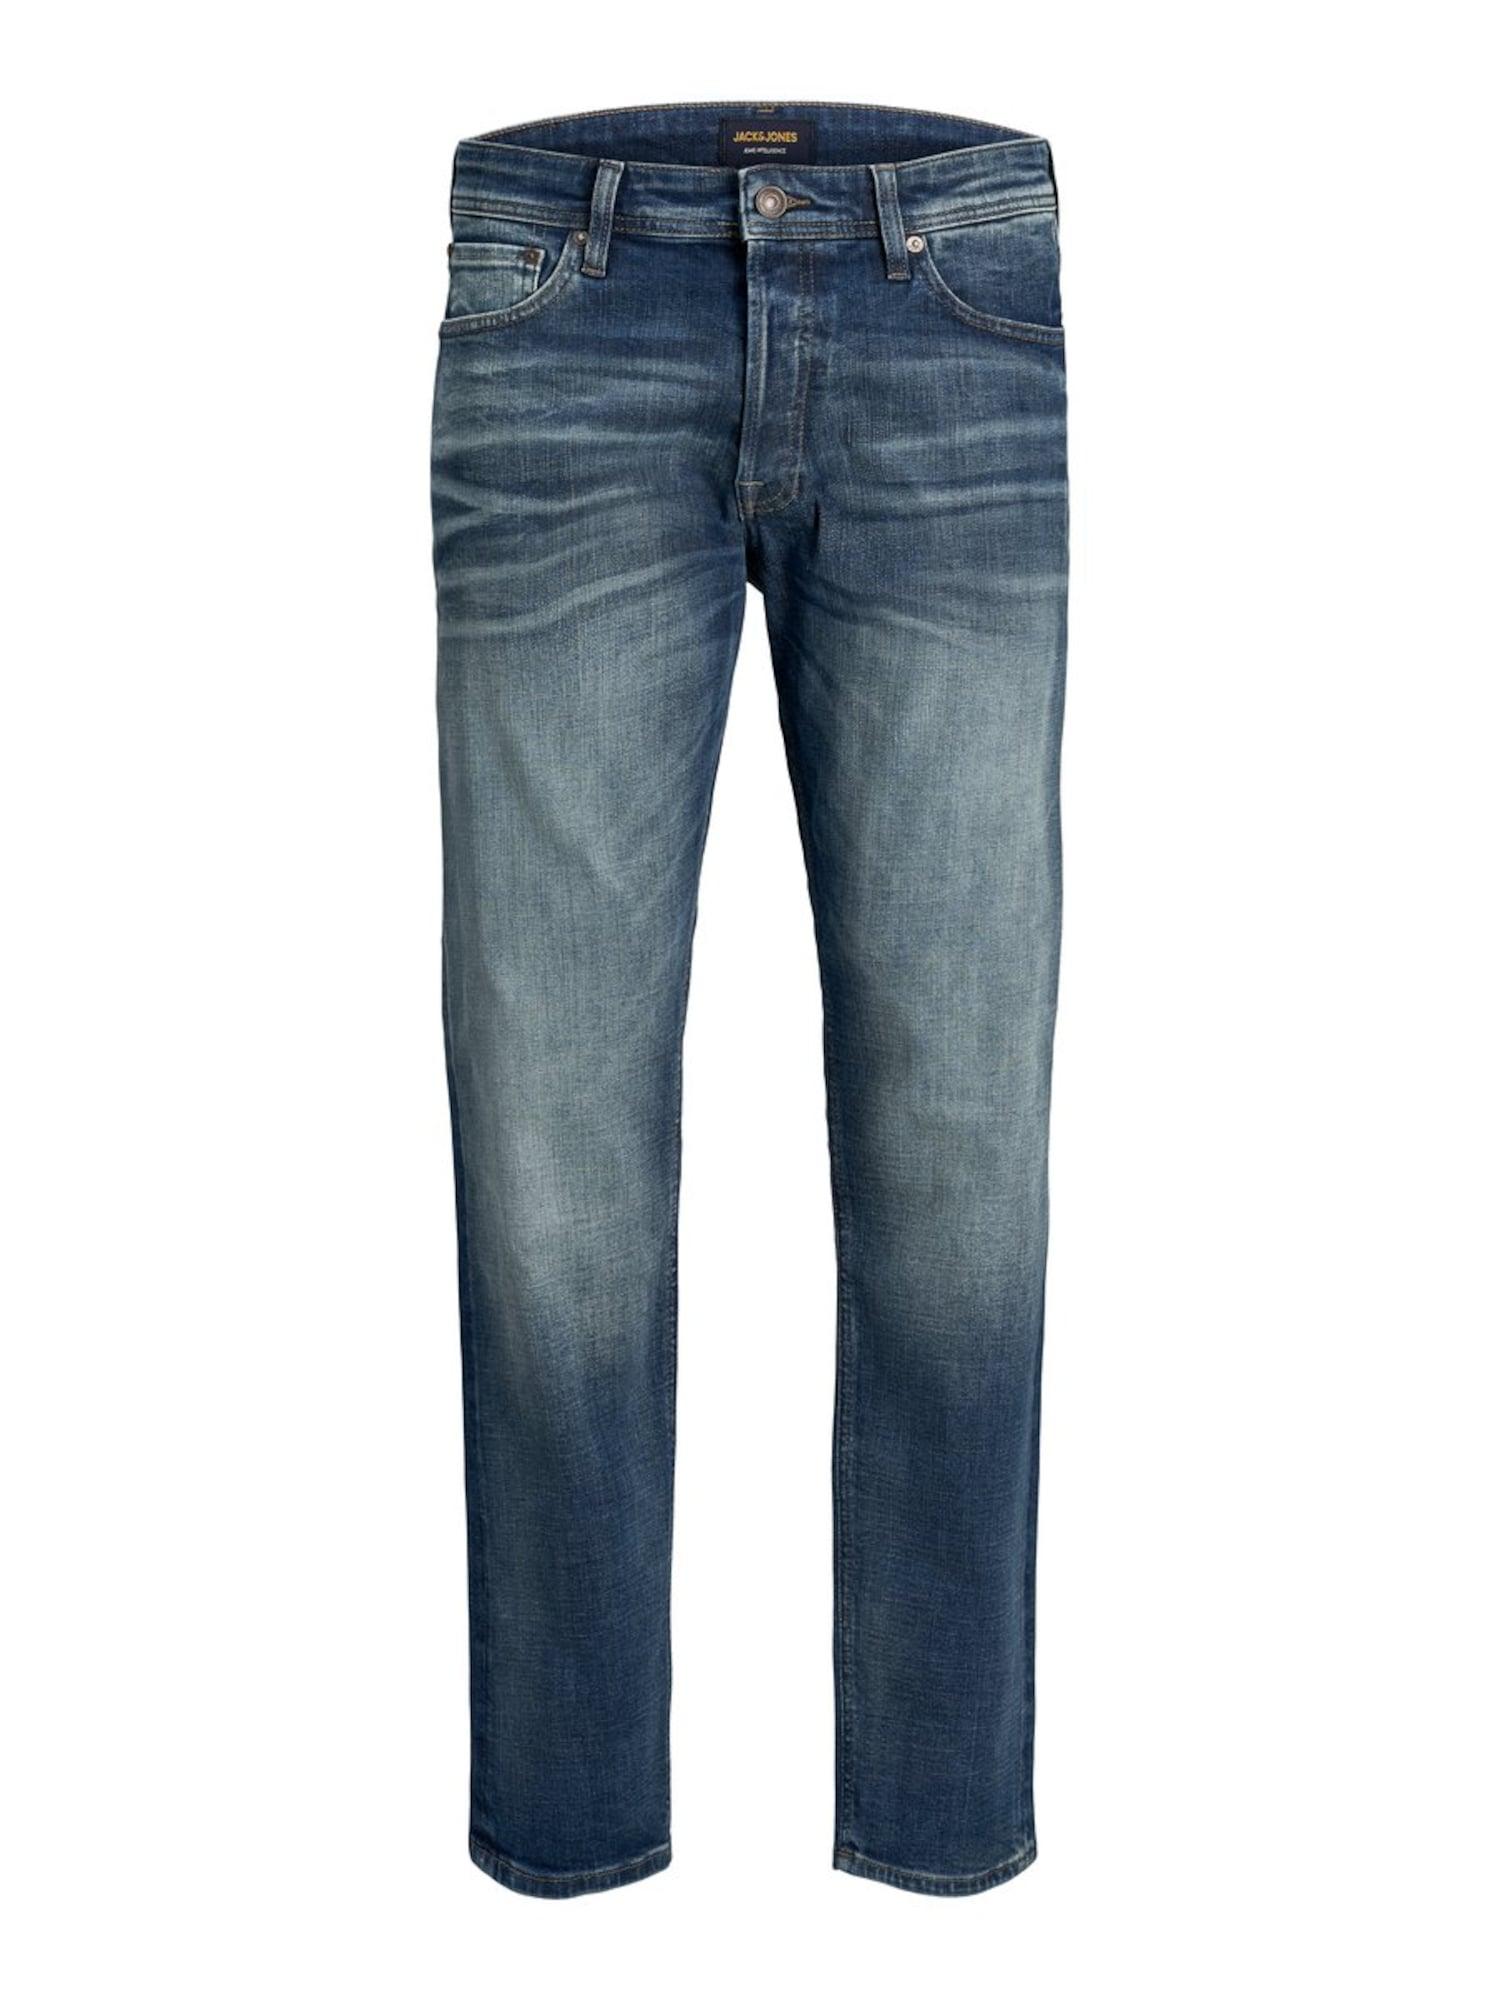 Loose Fit Jeans 'CHRIS ORIGINAL JOS 178' | Bekleidung > Jeans > Loose Fit Jeans | Blue | jack & jones